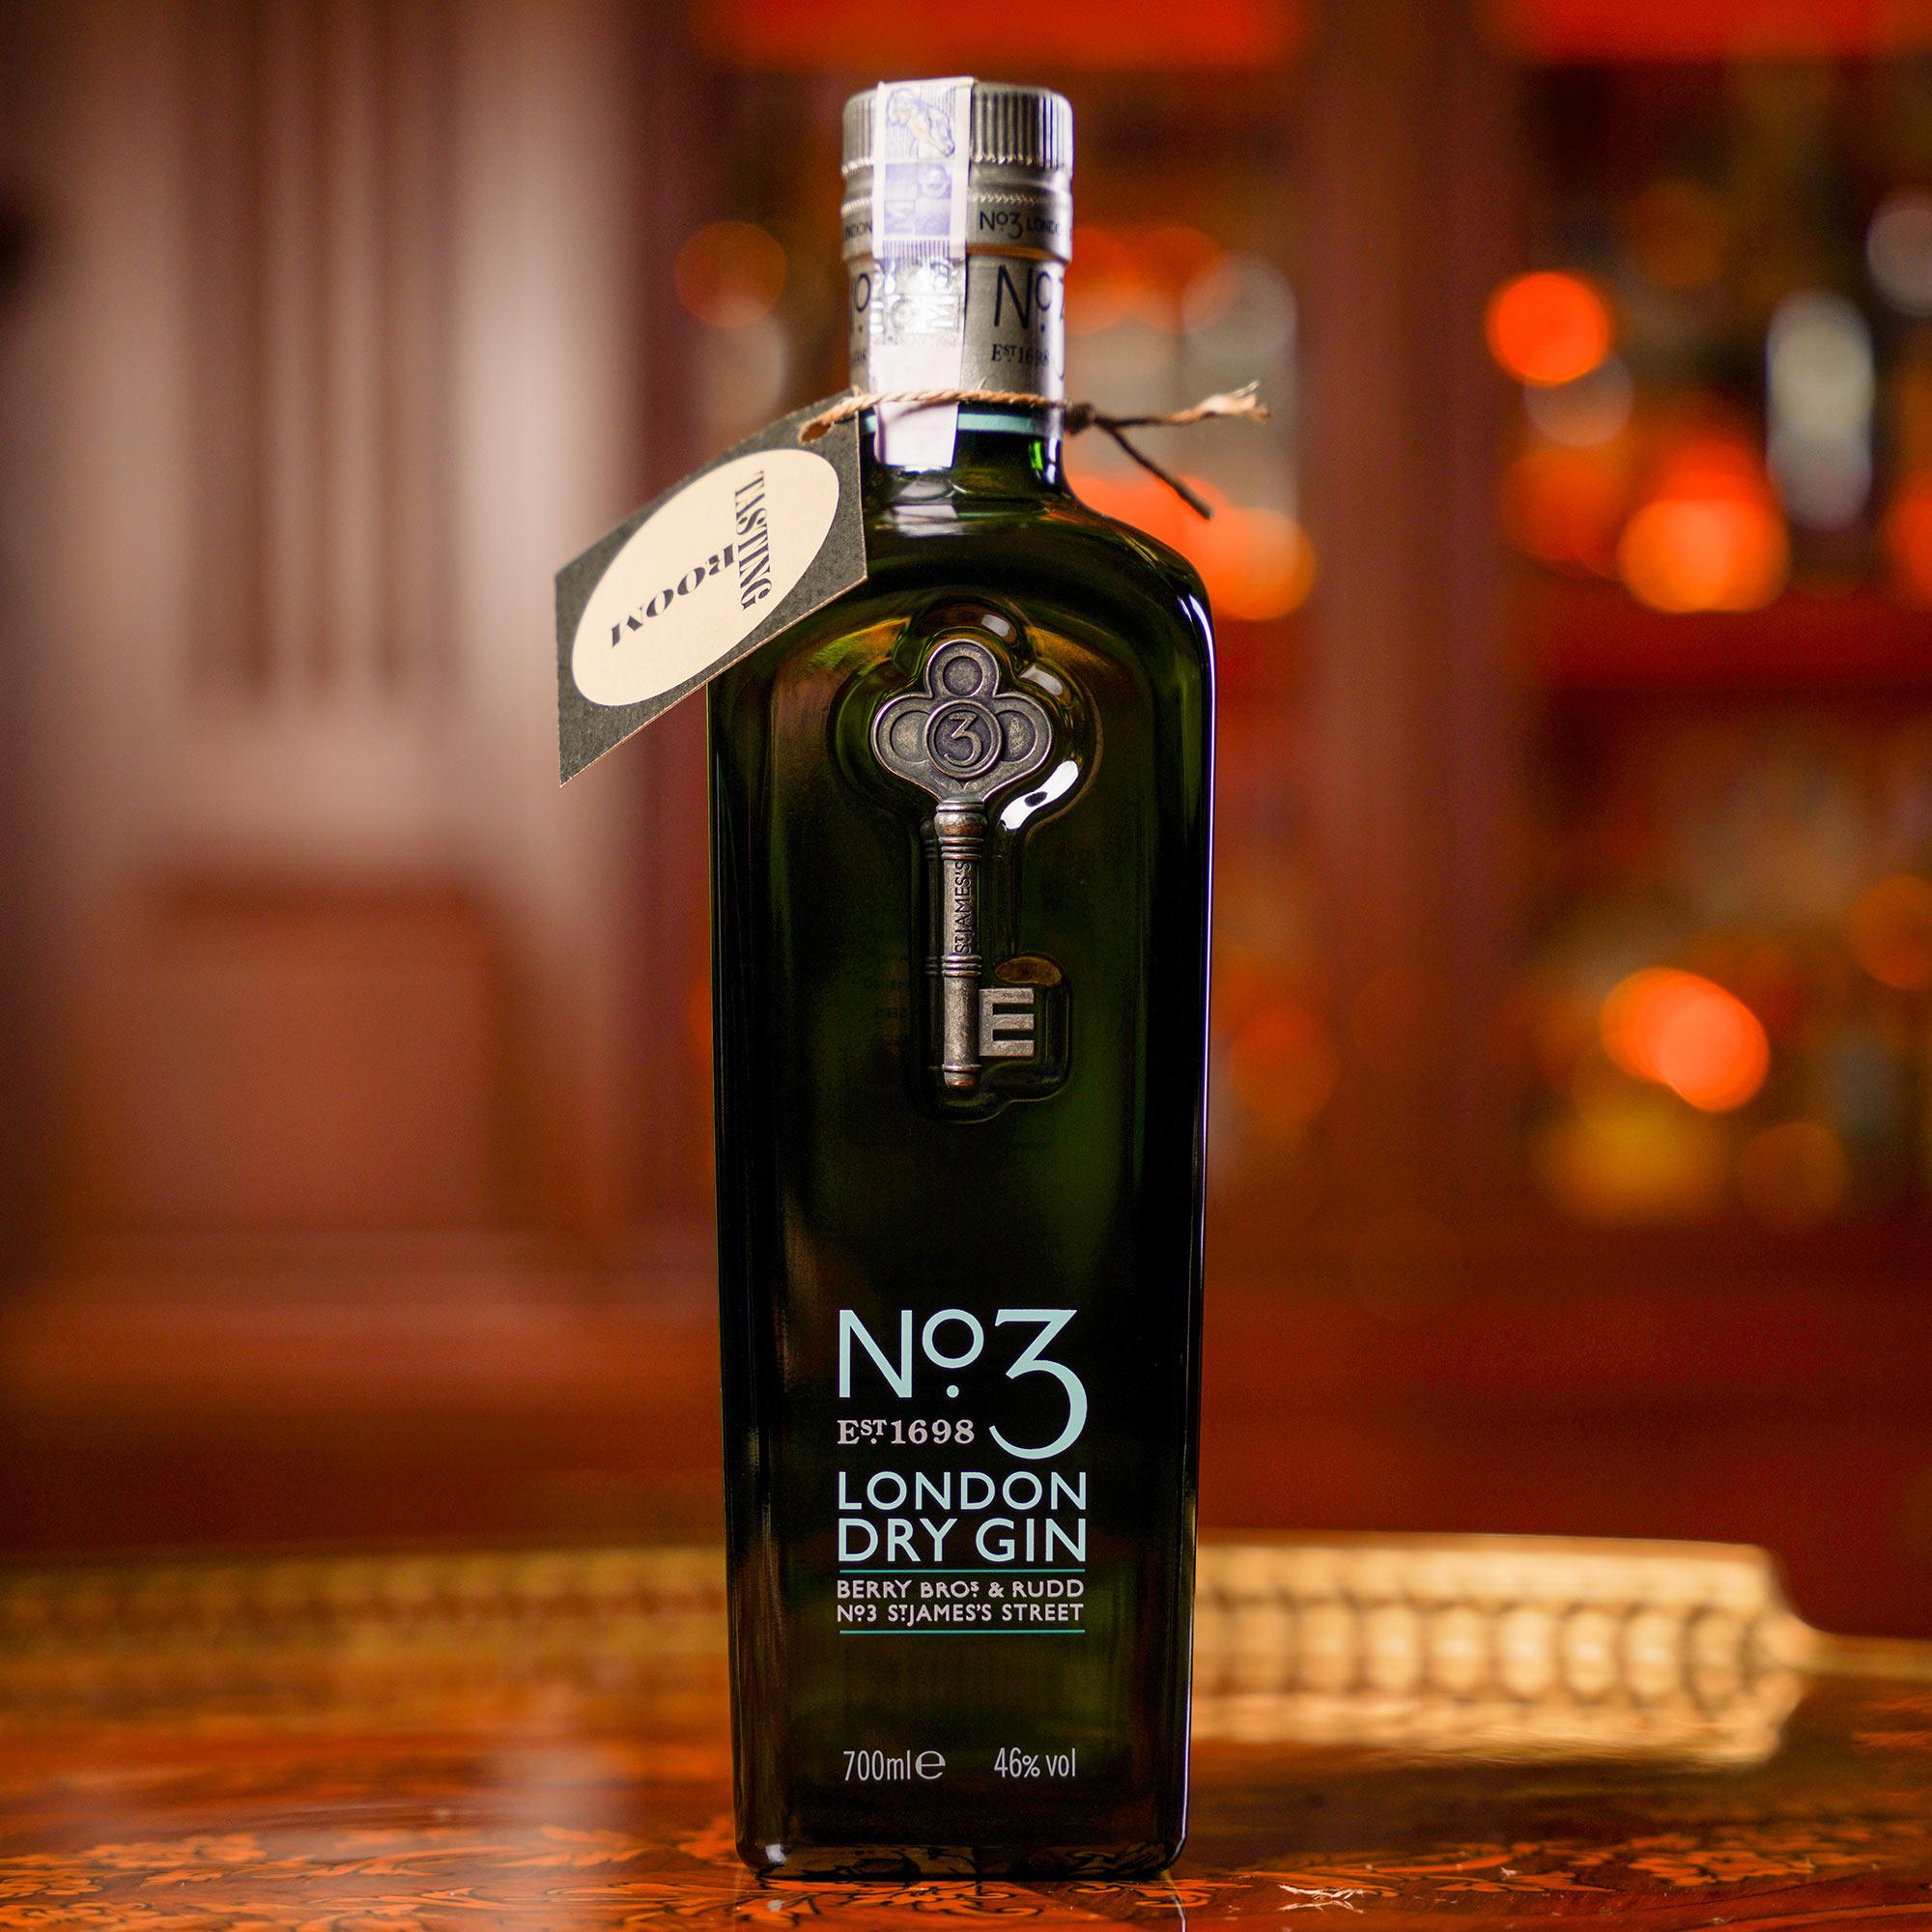 No. 3 London Dry Gin /Номер 3 Лондон Драй Джин